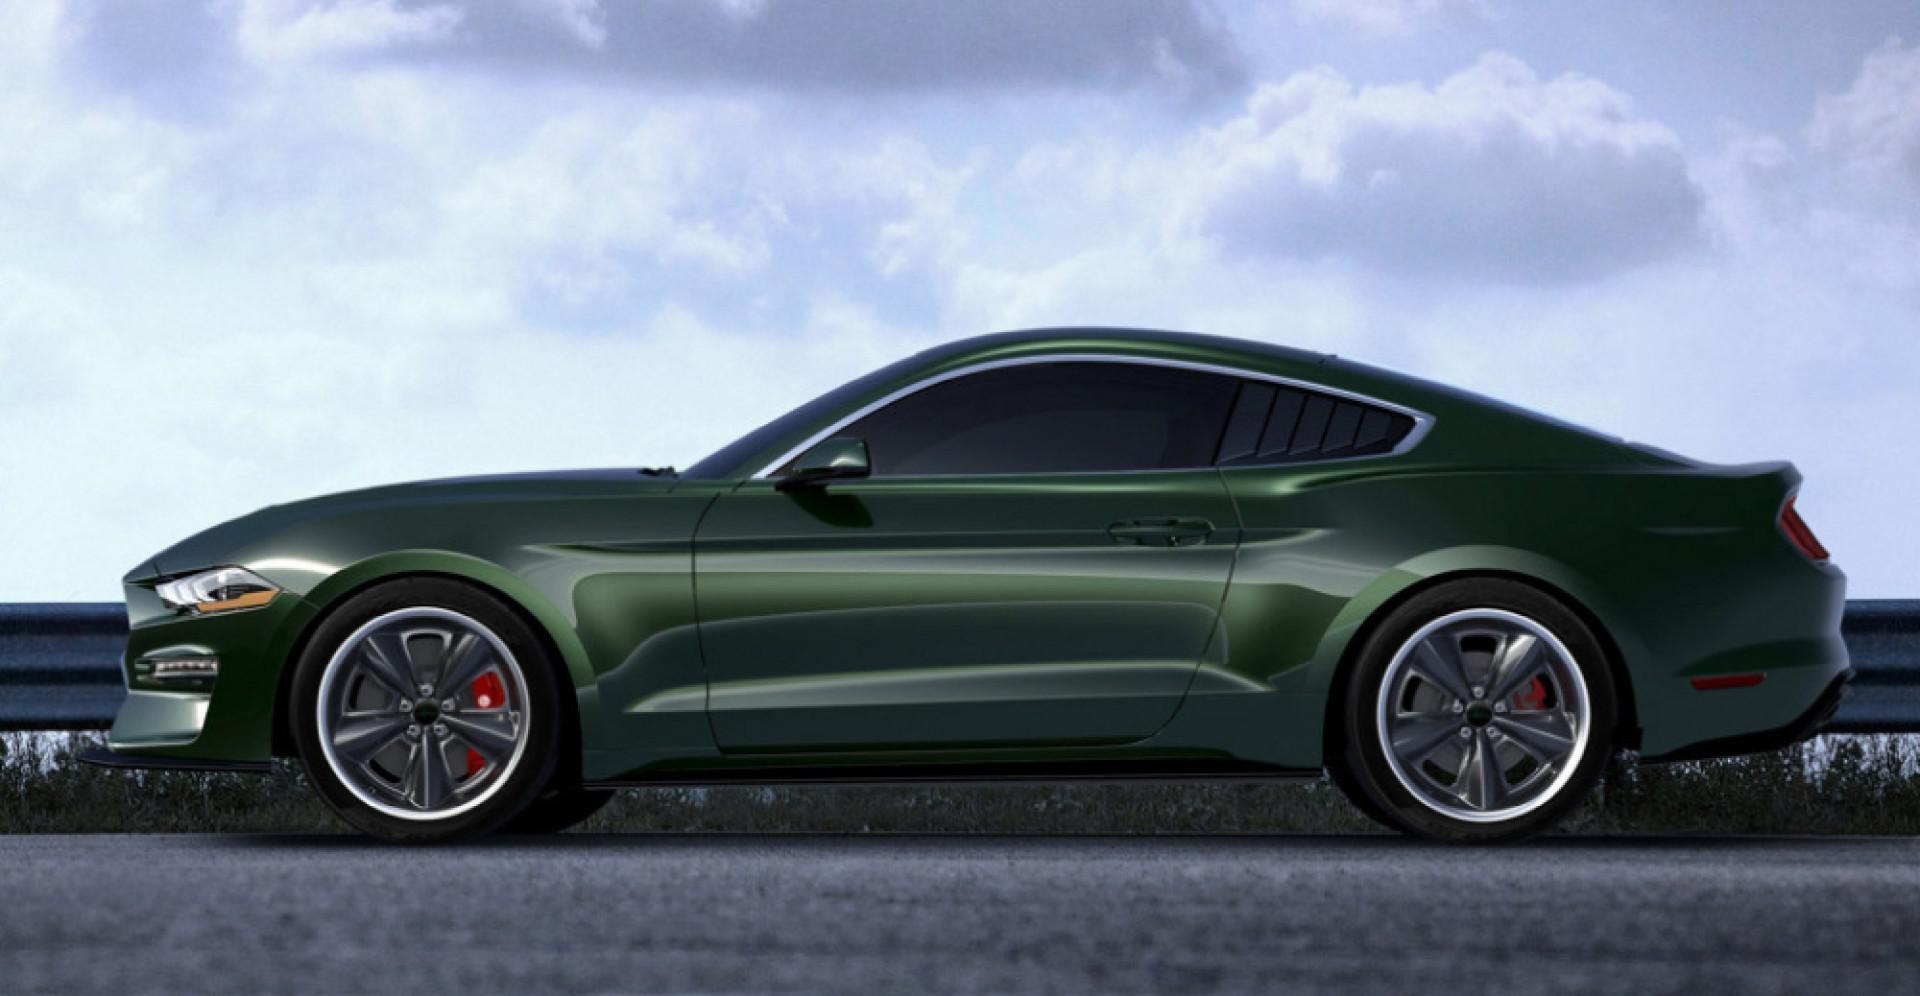 Une version spéciale:Steve McQueen Edition Ford Mustang Bullitt